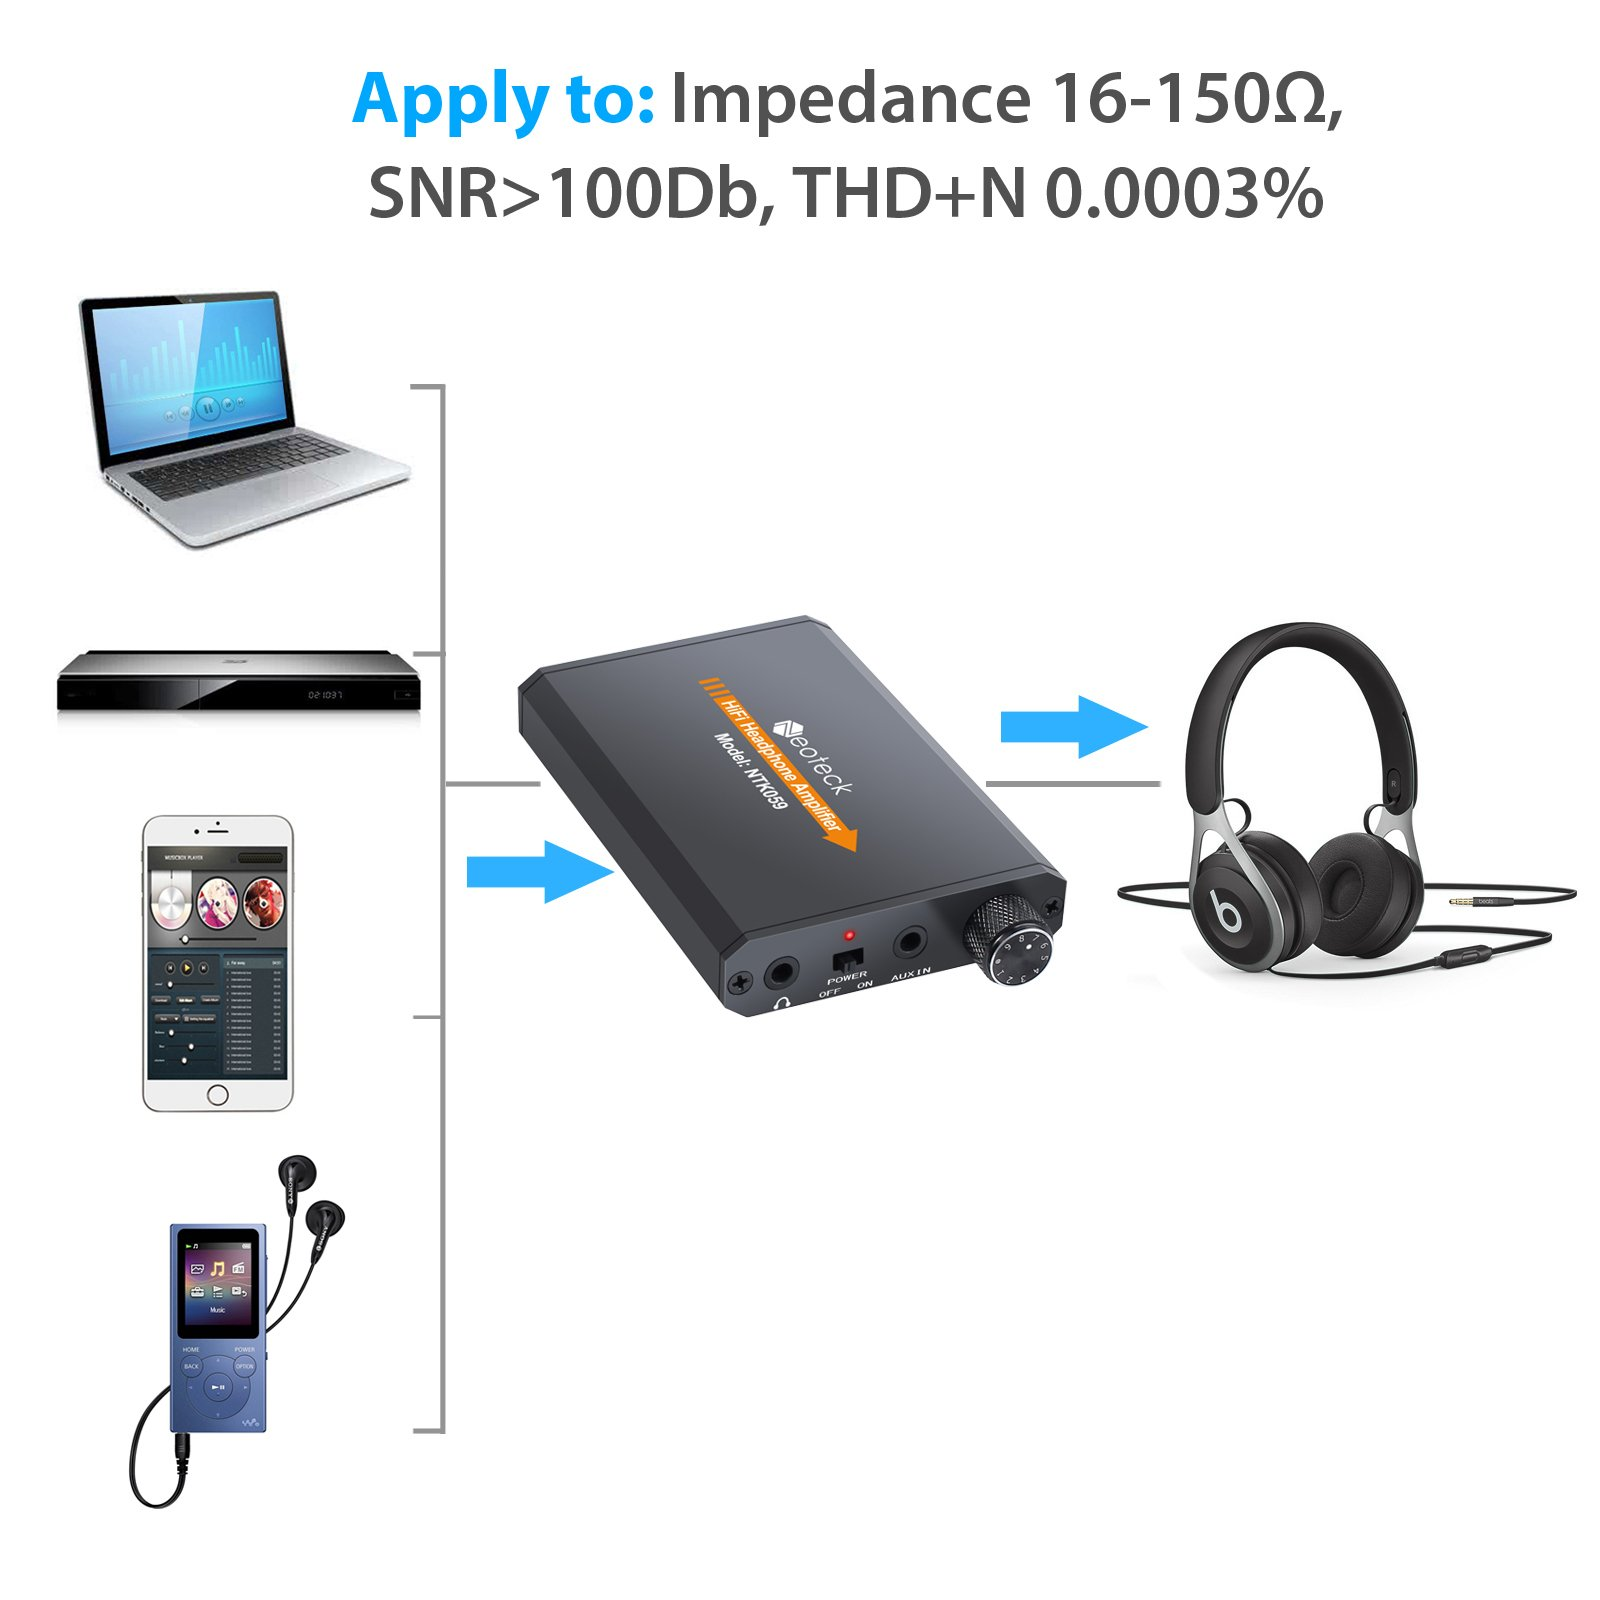 Neoteck Headphone Amplifier Portable 3 5mm Audio Rechargeble